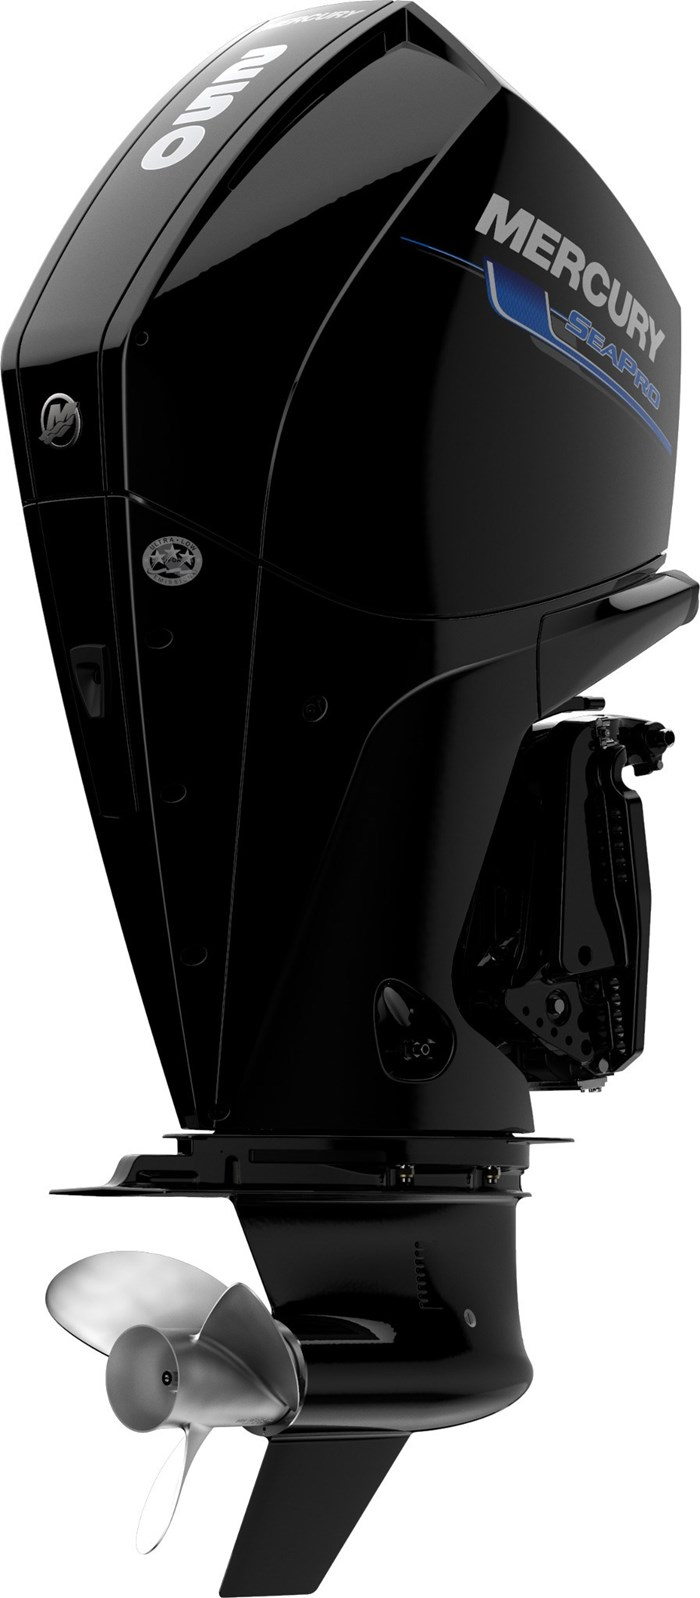 2022 Mercury 300XL V-8 4-Stroke SeaPro Commercial Photo 9 sur 20